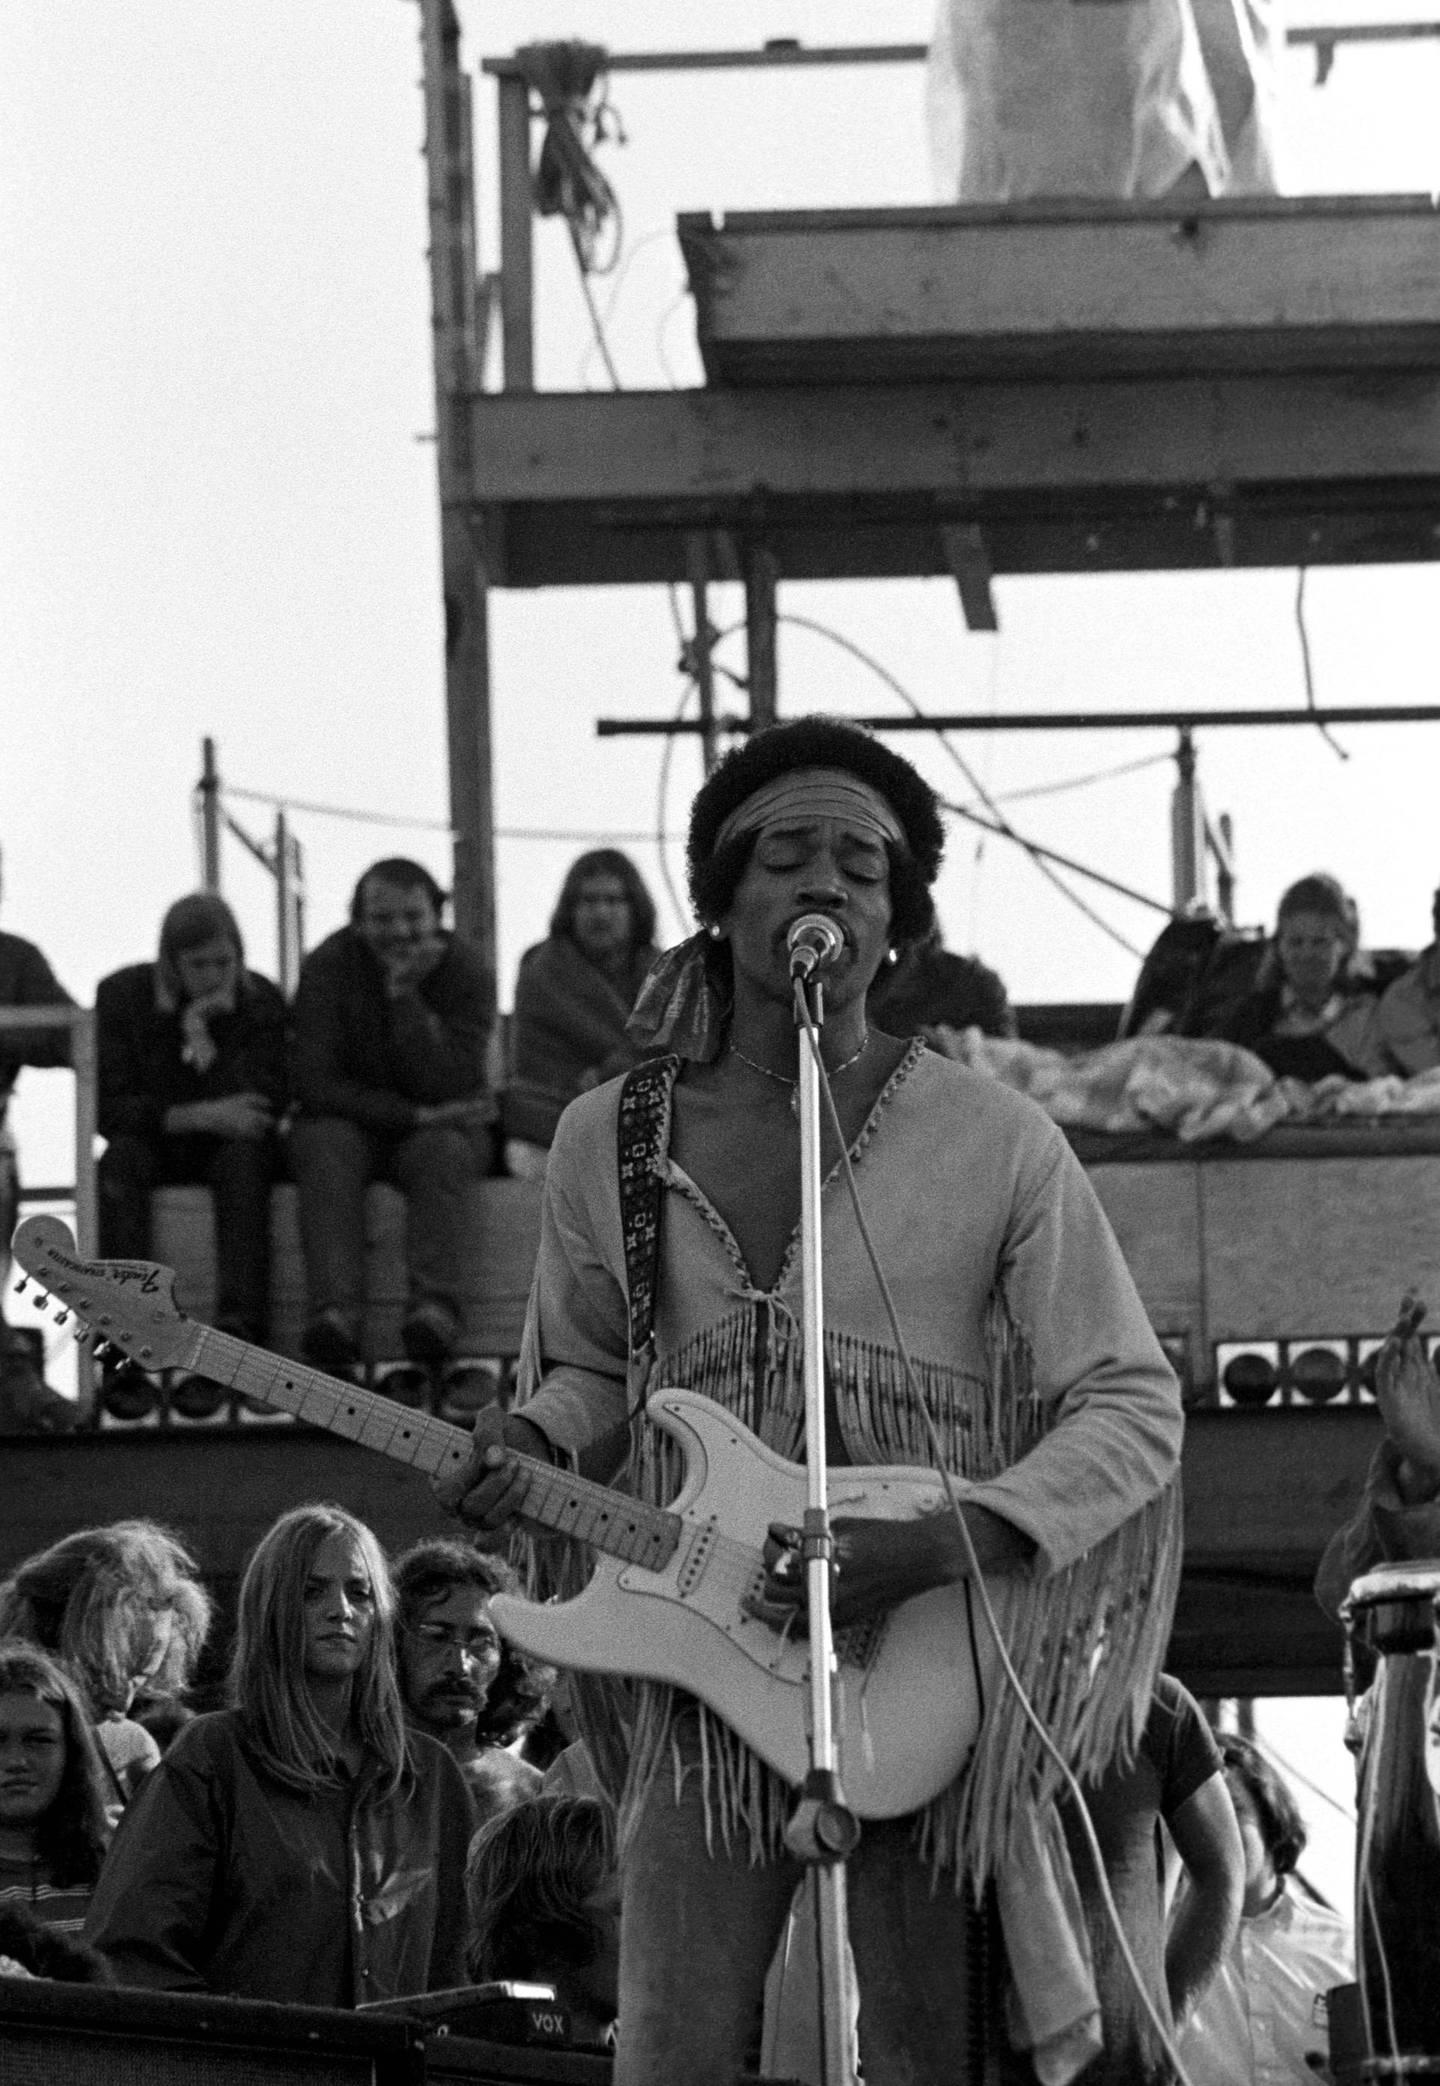 Mandatory Credit: Photo by Peter Tarnoff/Mediapunch/Shutterstock (9853935a)Jimi HendrixWoodstock - 18 Aug 1969